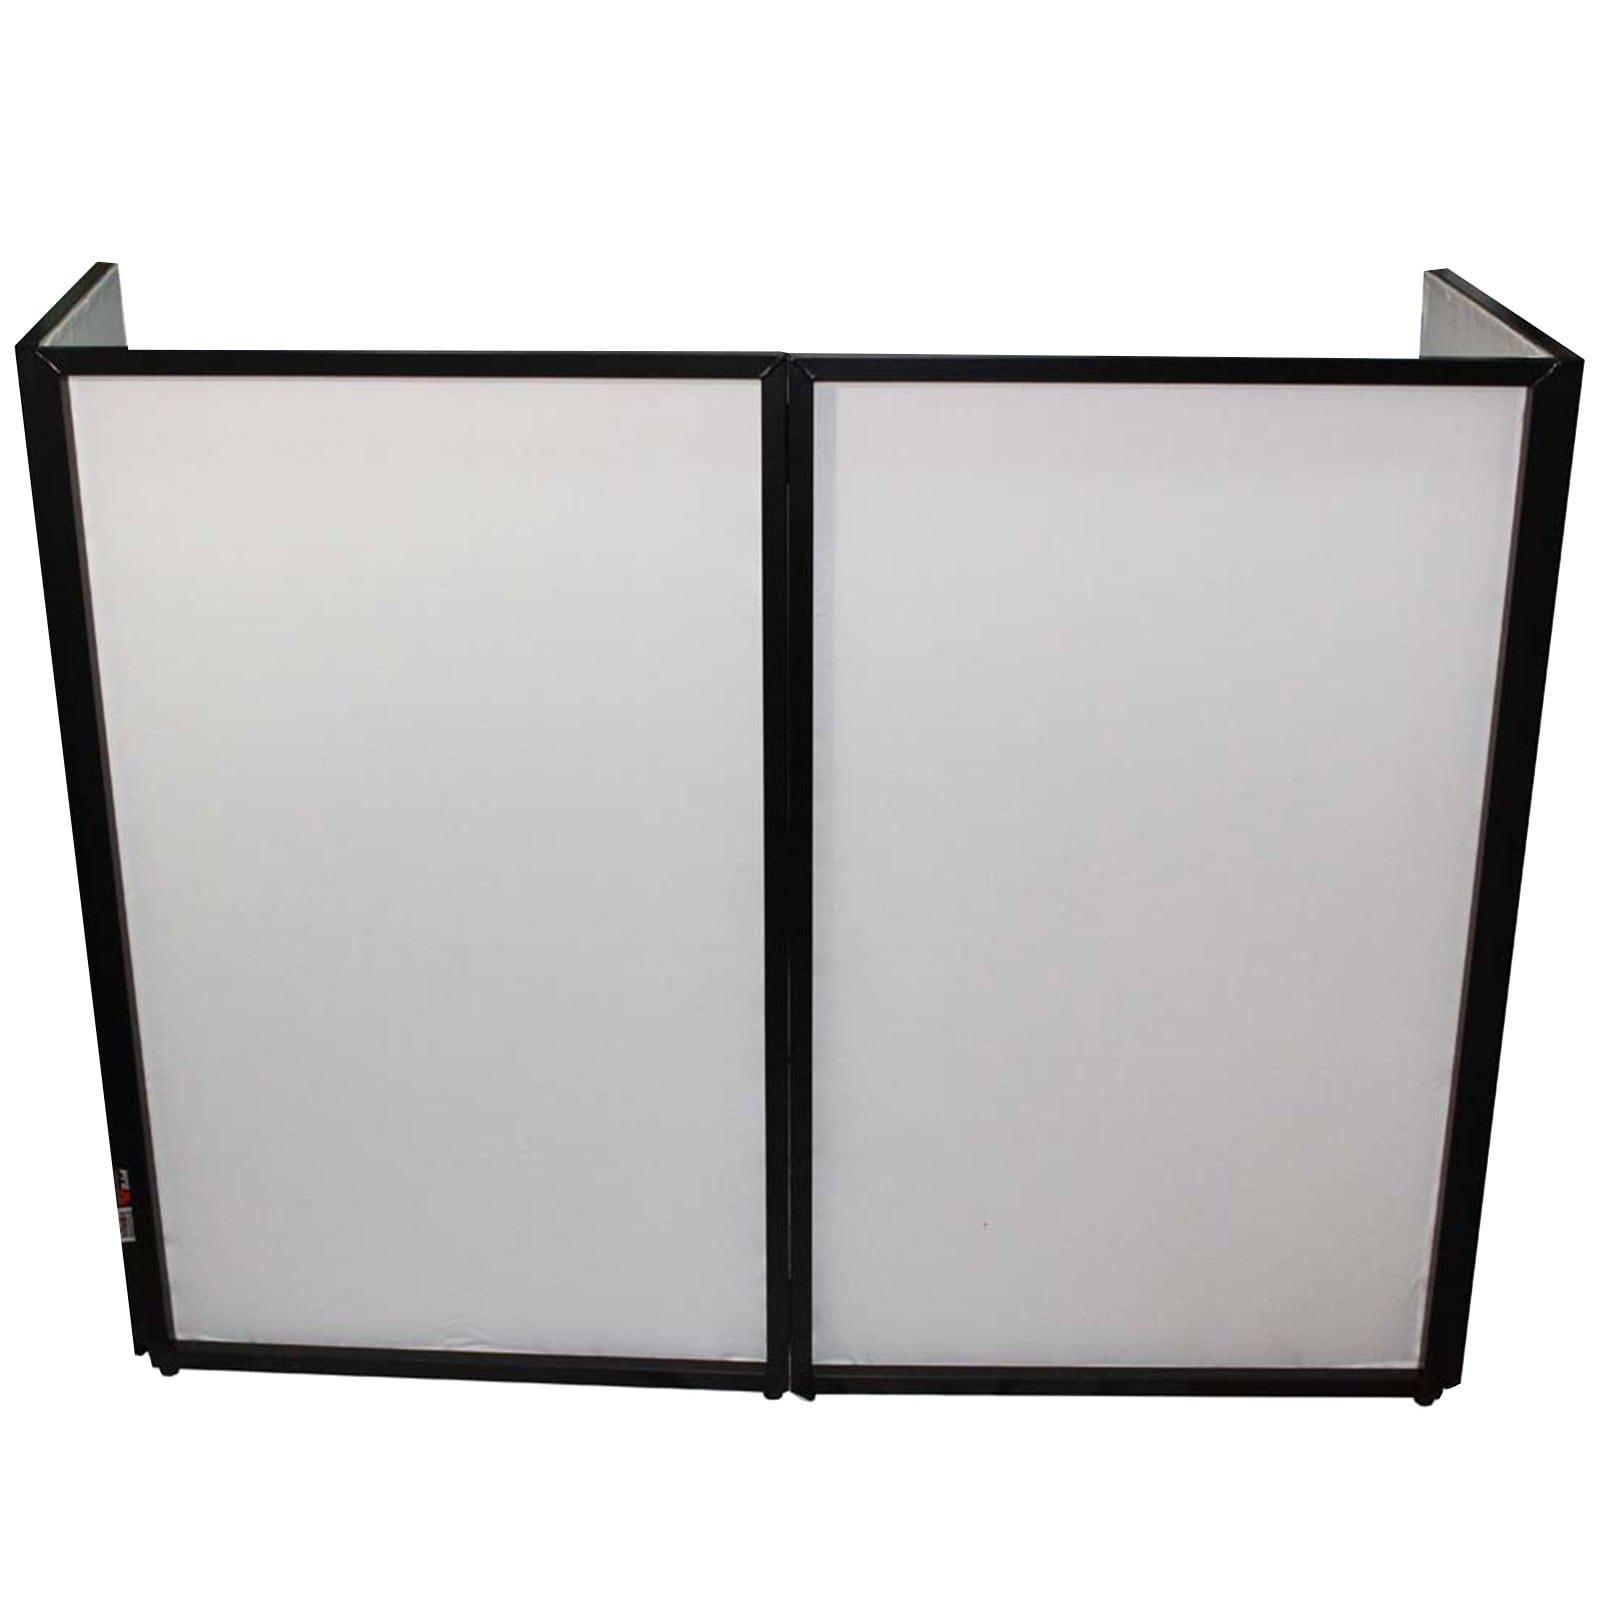 prox-xf-4x3048b-black-aluminum-4-panel-scrim-facade-package-159.jpg